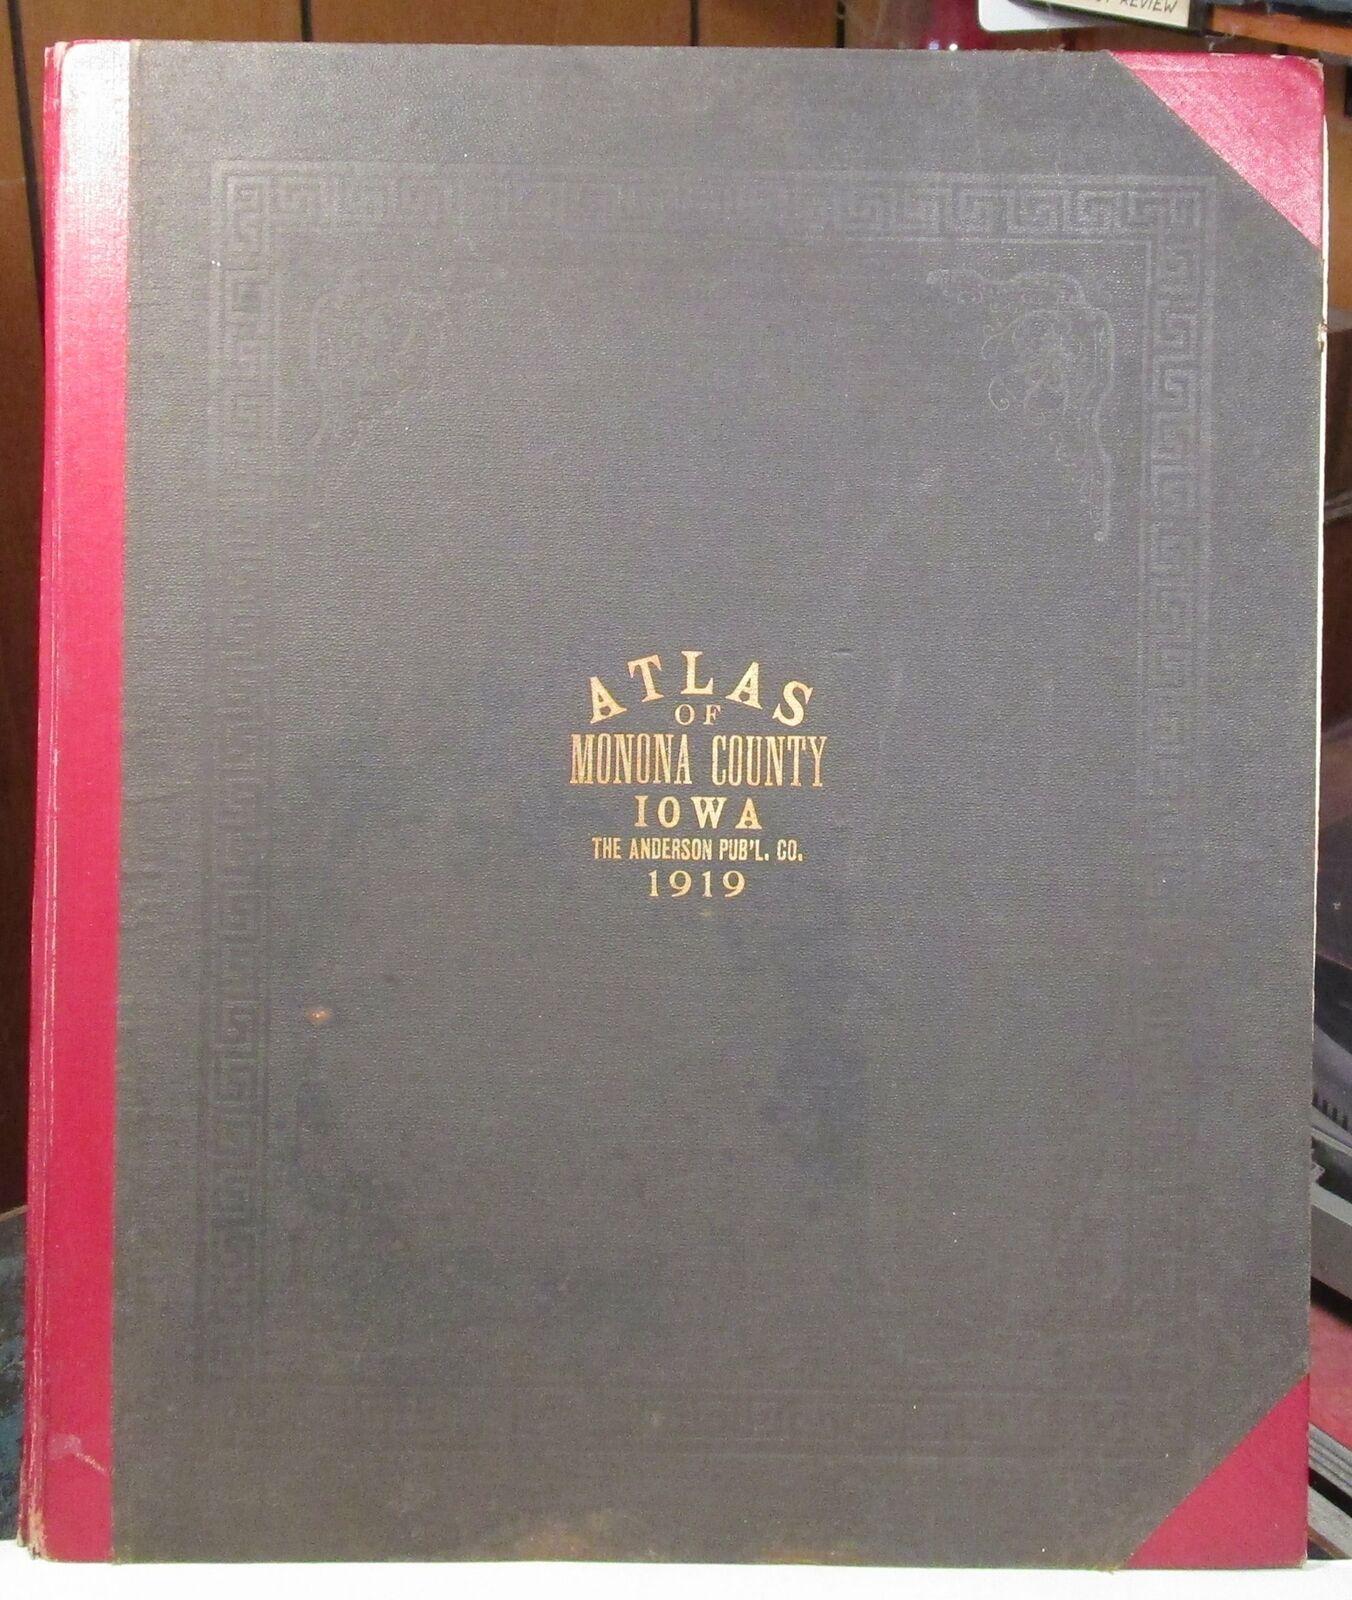 1919 Atlas of Monona County Iowa